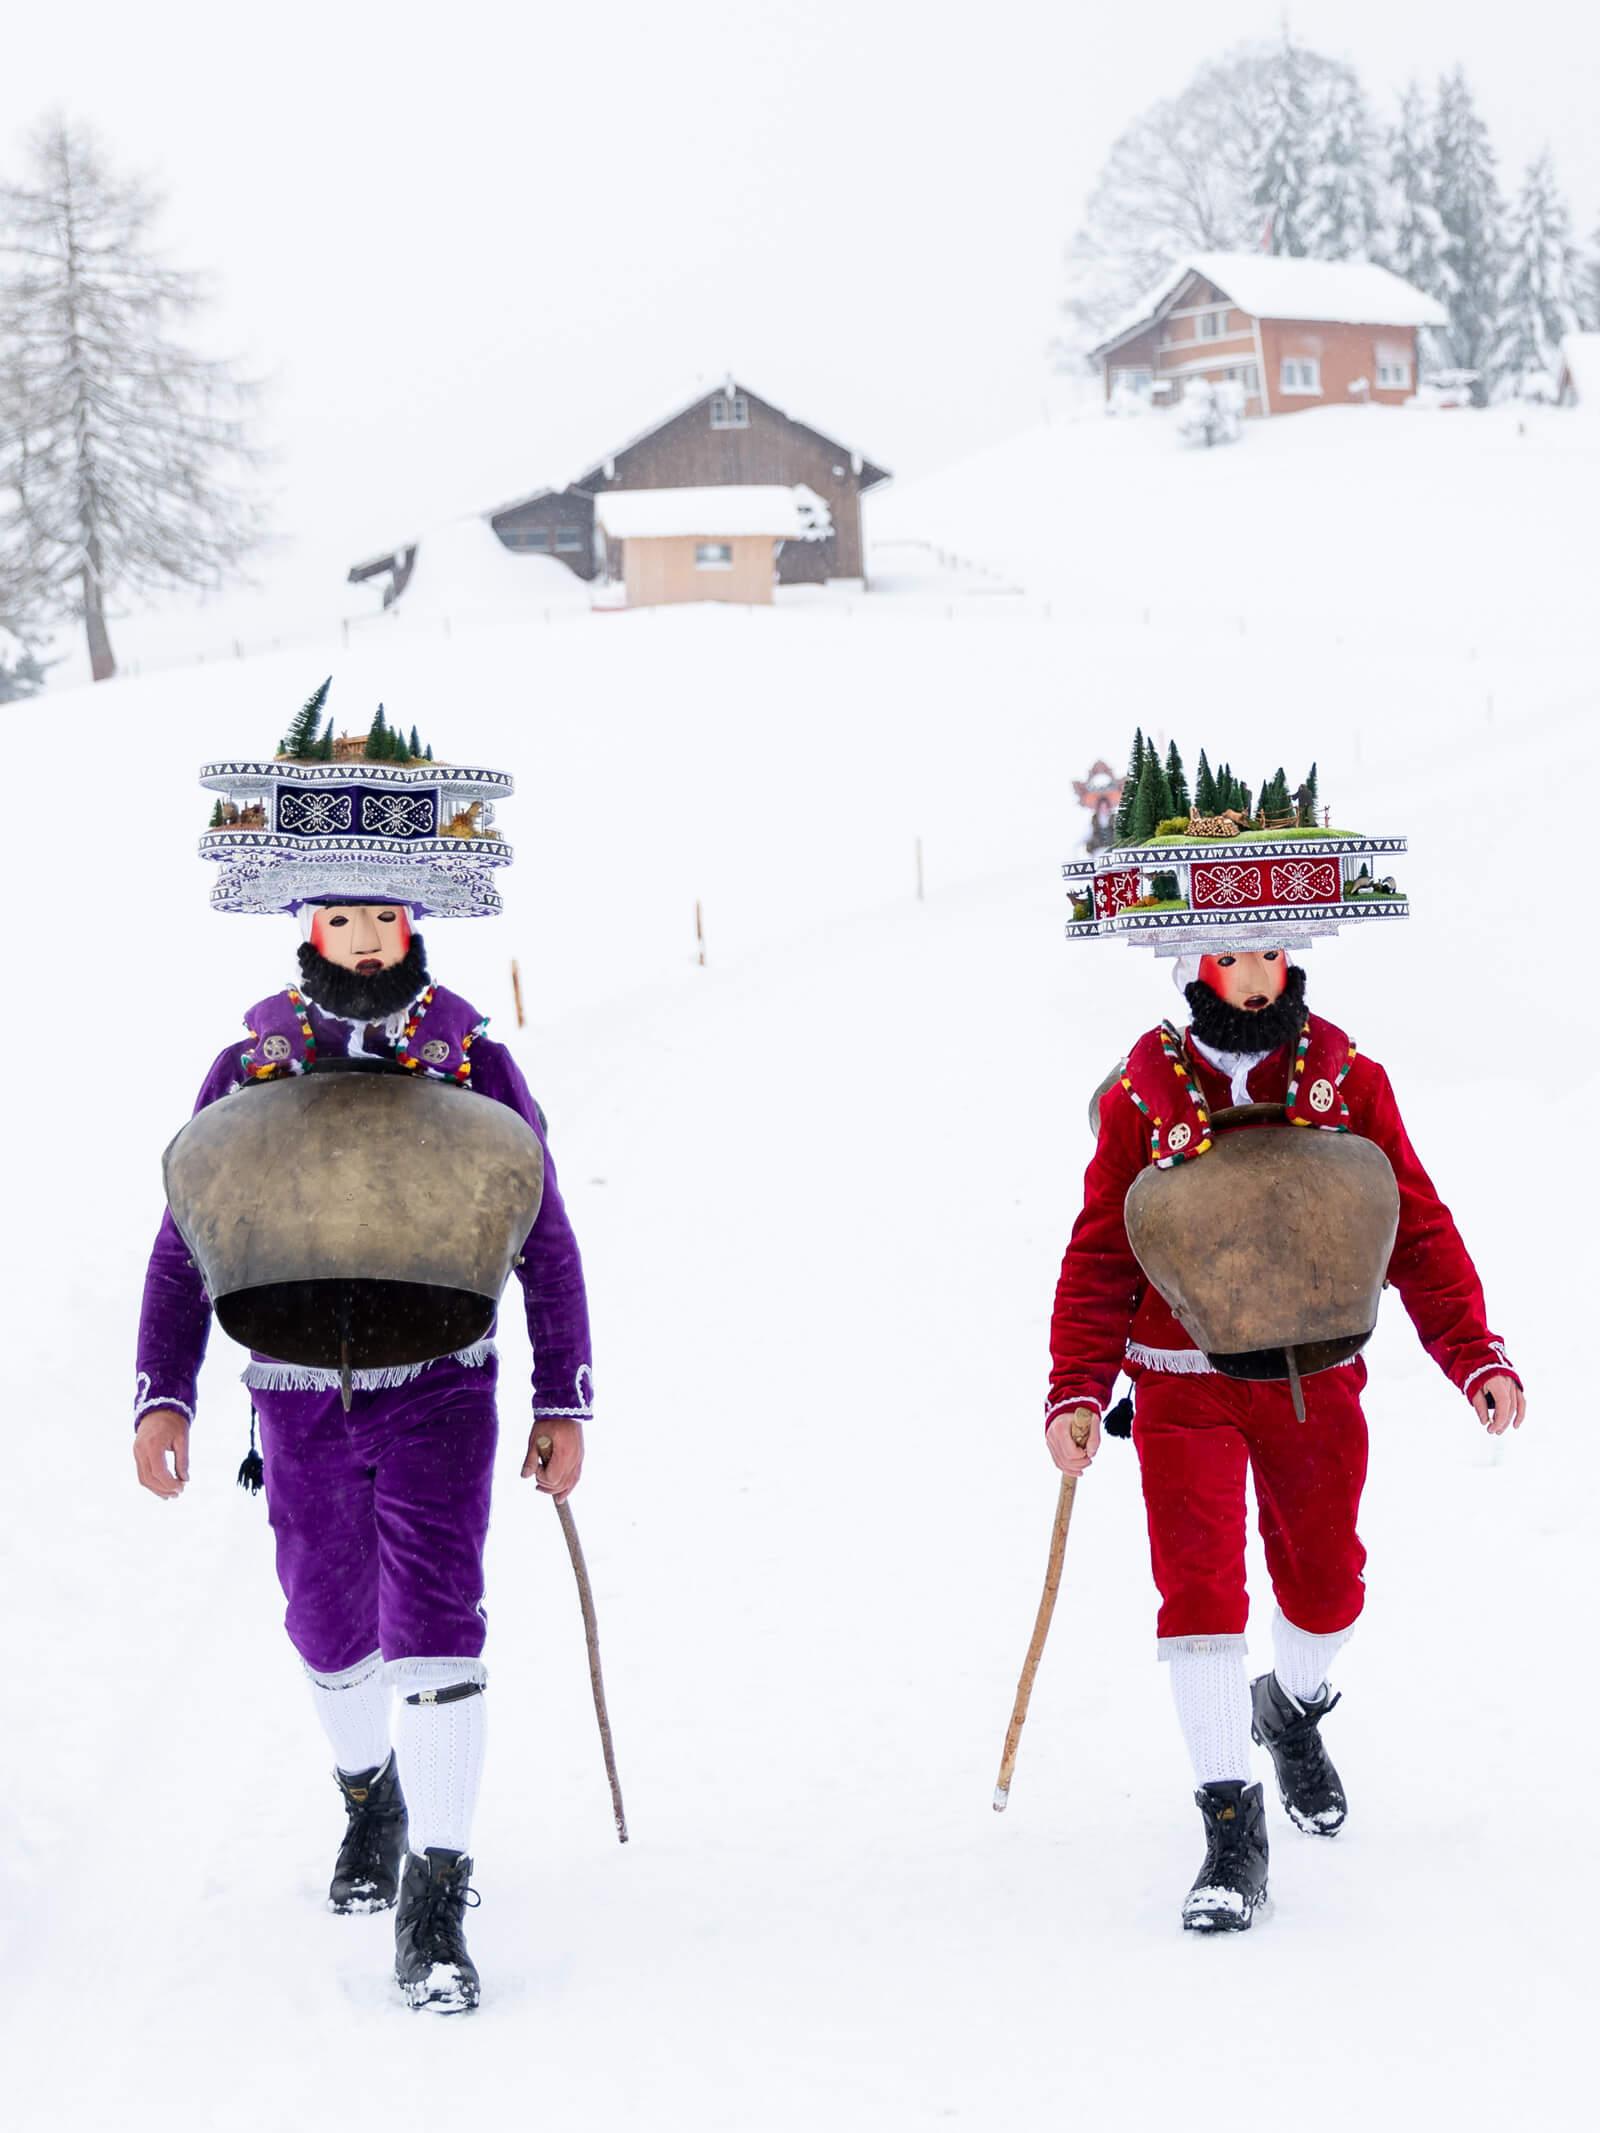 Silvesterklausen in Appenzell Ausserrhoden